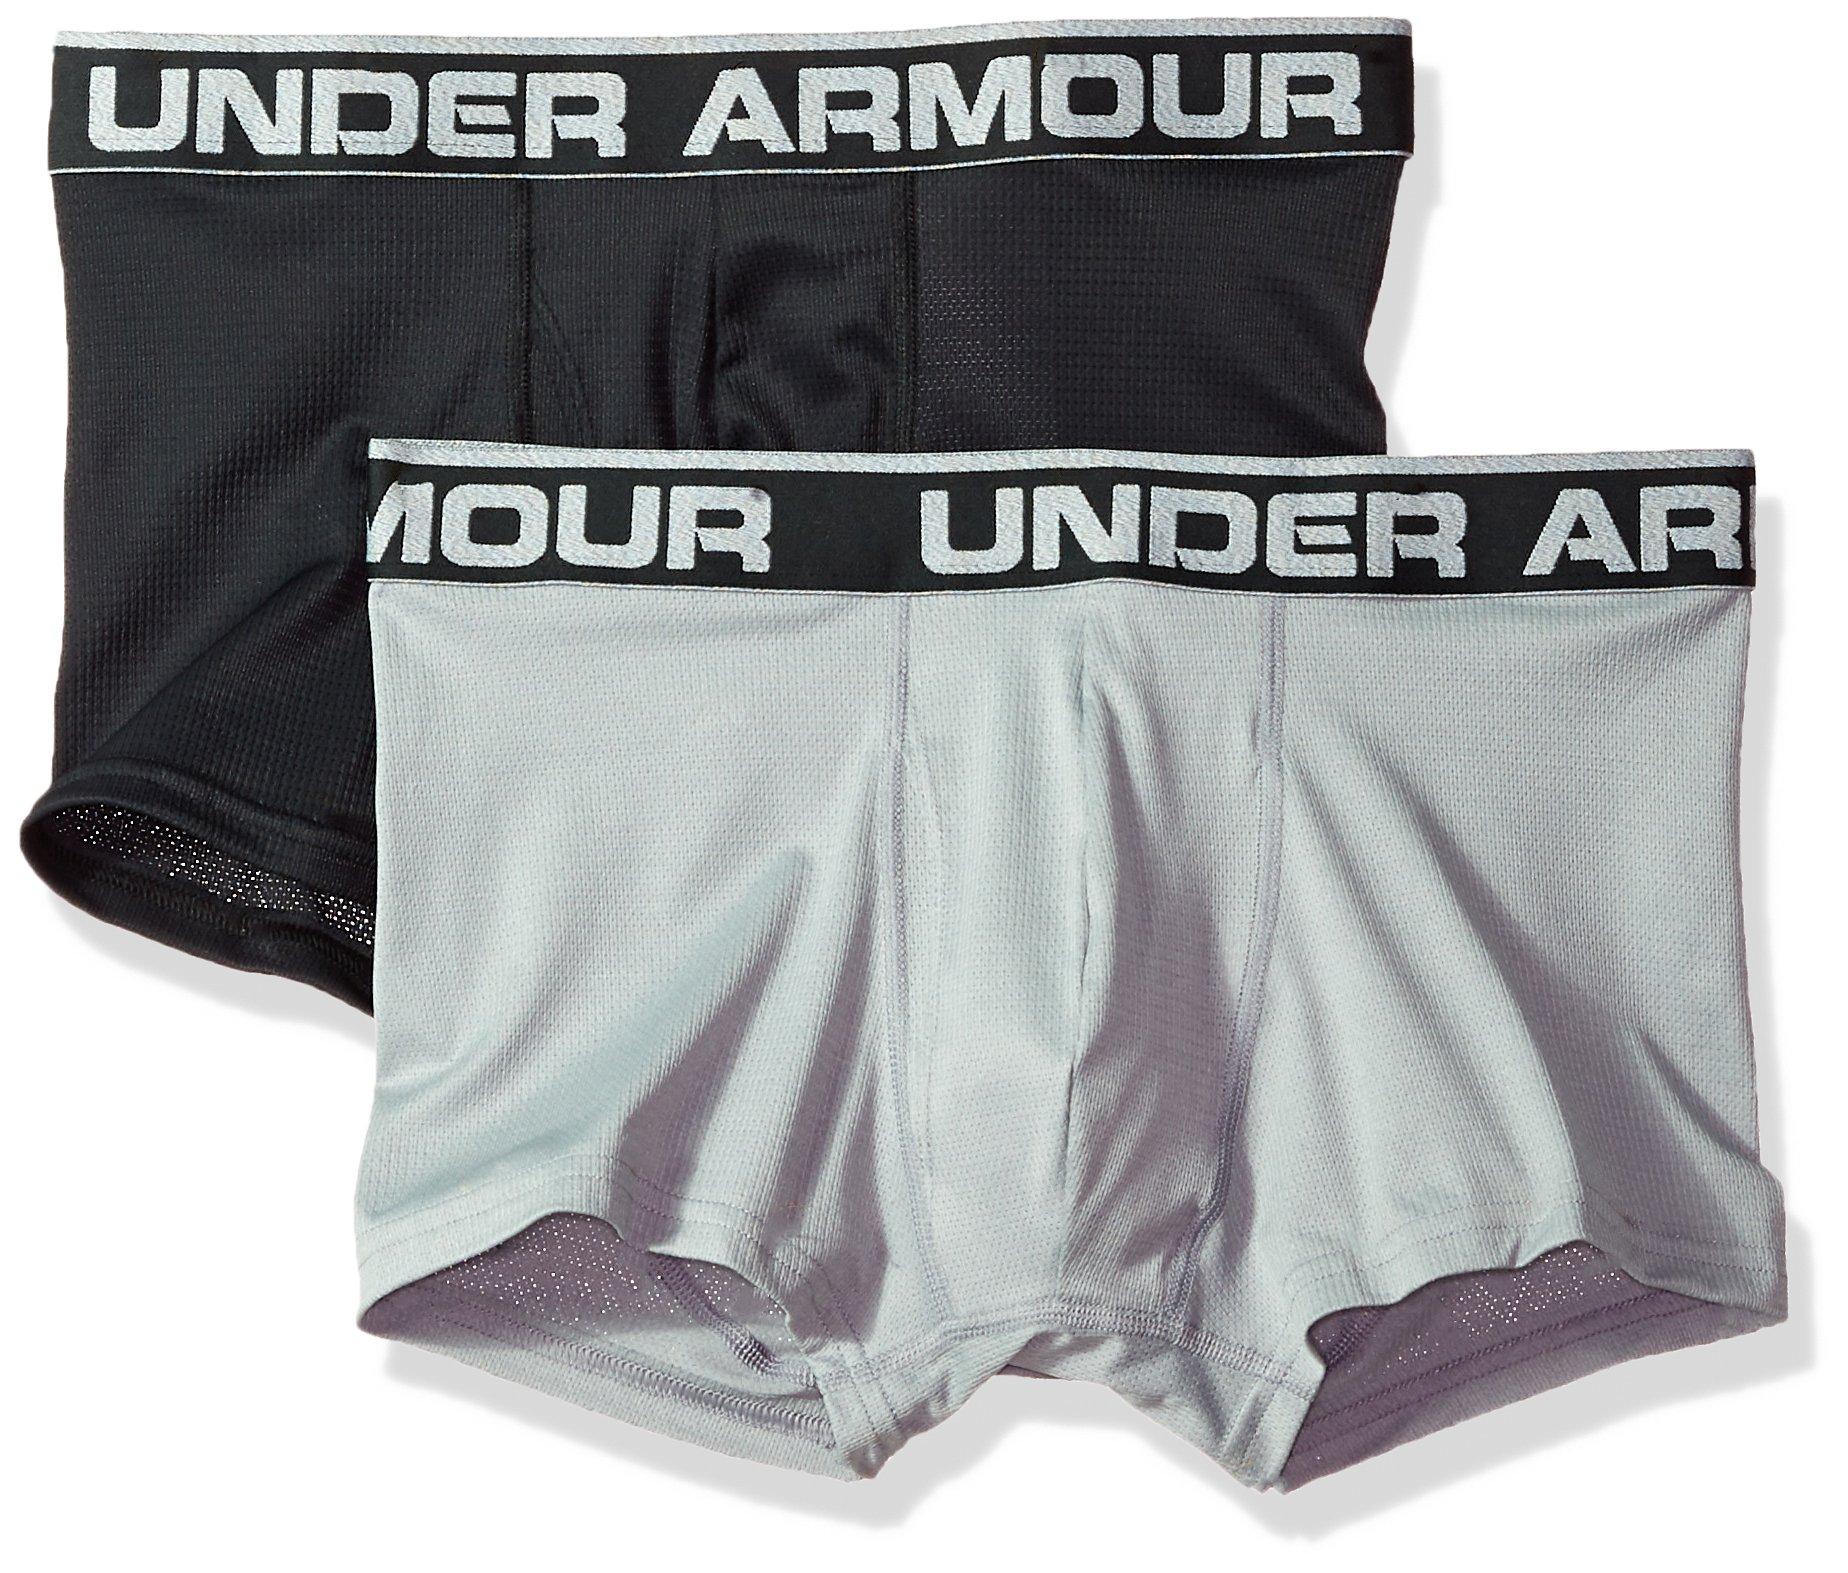 Under Armour Men's Tech Mesh 6'' Boxerjock – 2-Pack, Black (001), X-Large